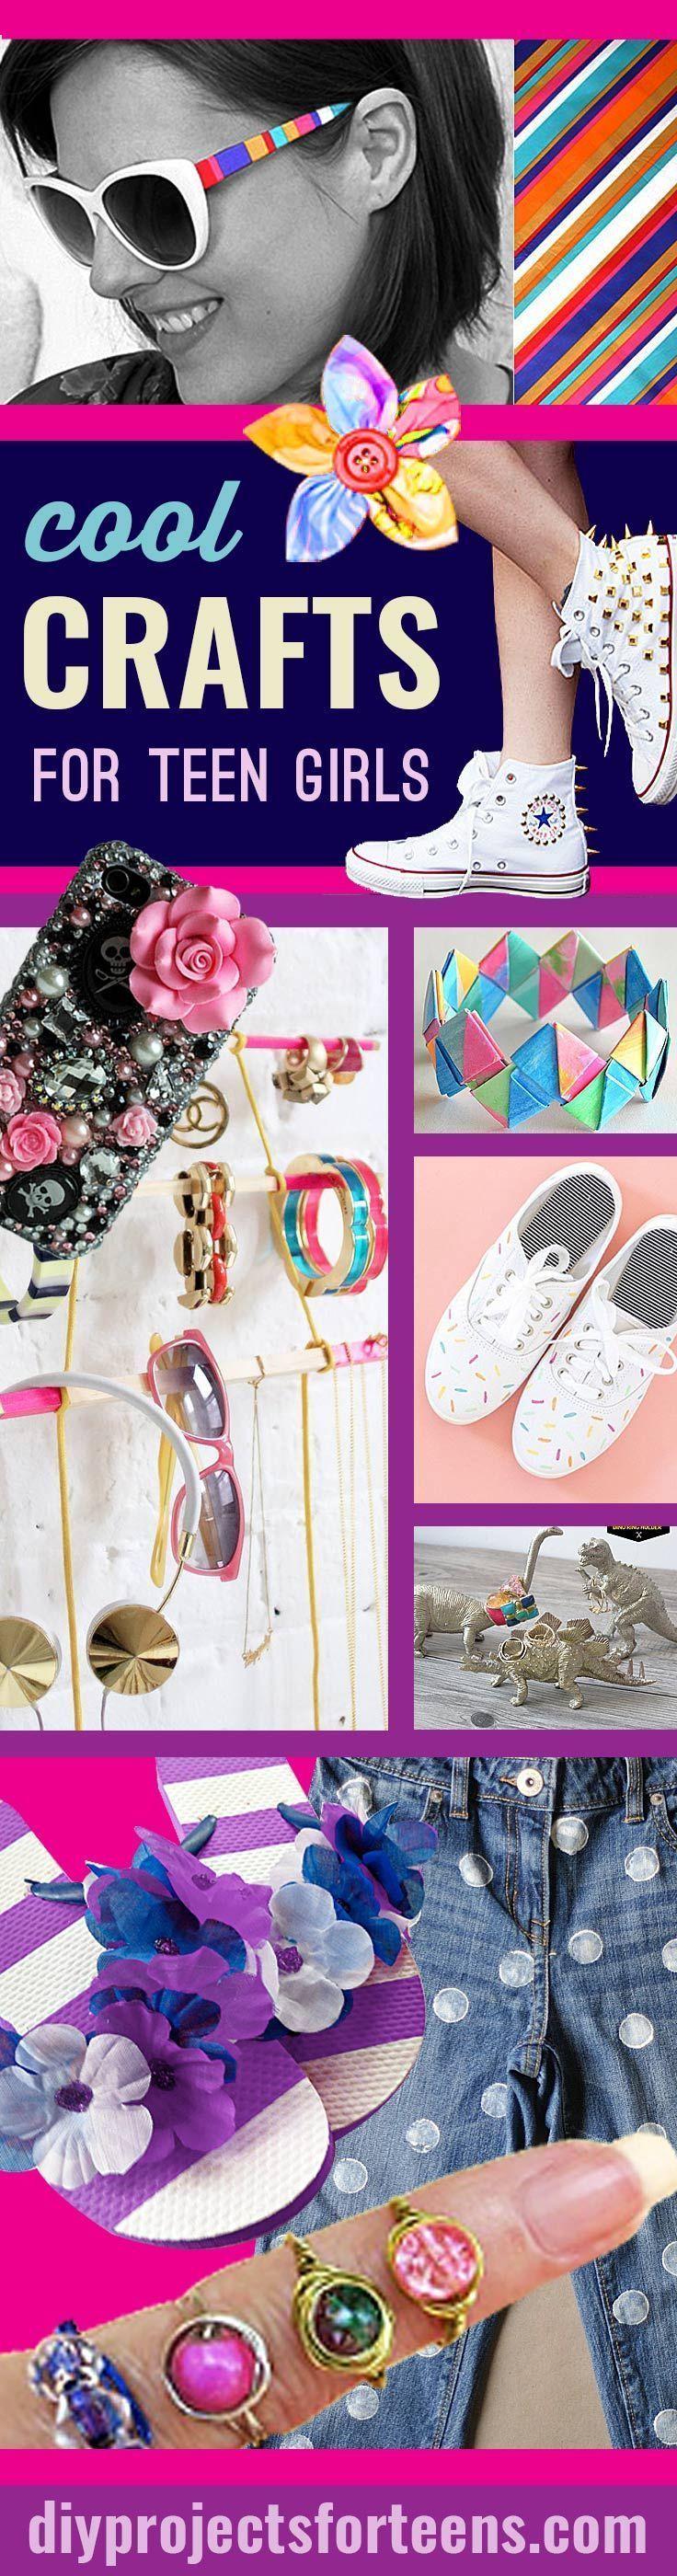 Diy crafts for teenage girls